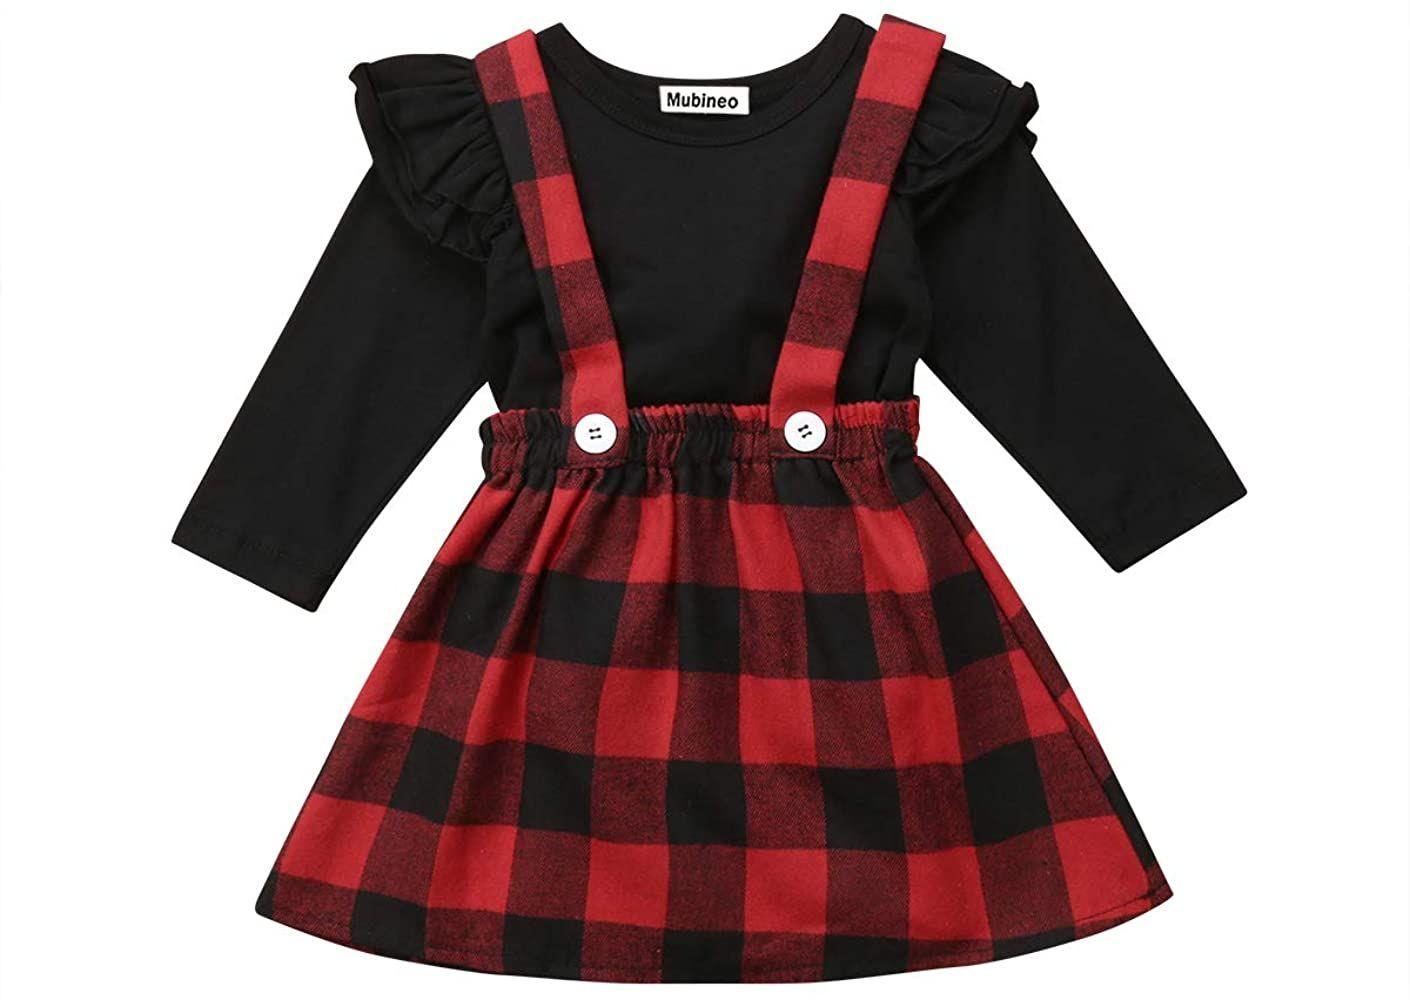 Mubineo Little Toddler Girl Corduroy Ruffle Suspender Skirt Basic Plain Cotton Overall Skirts